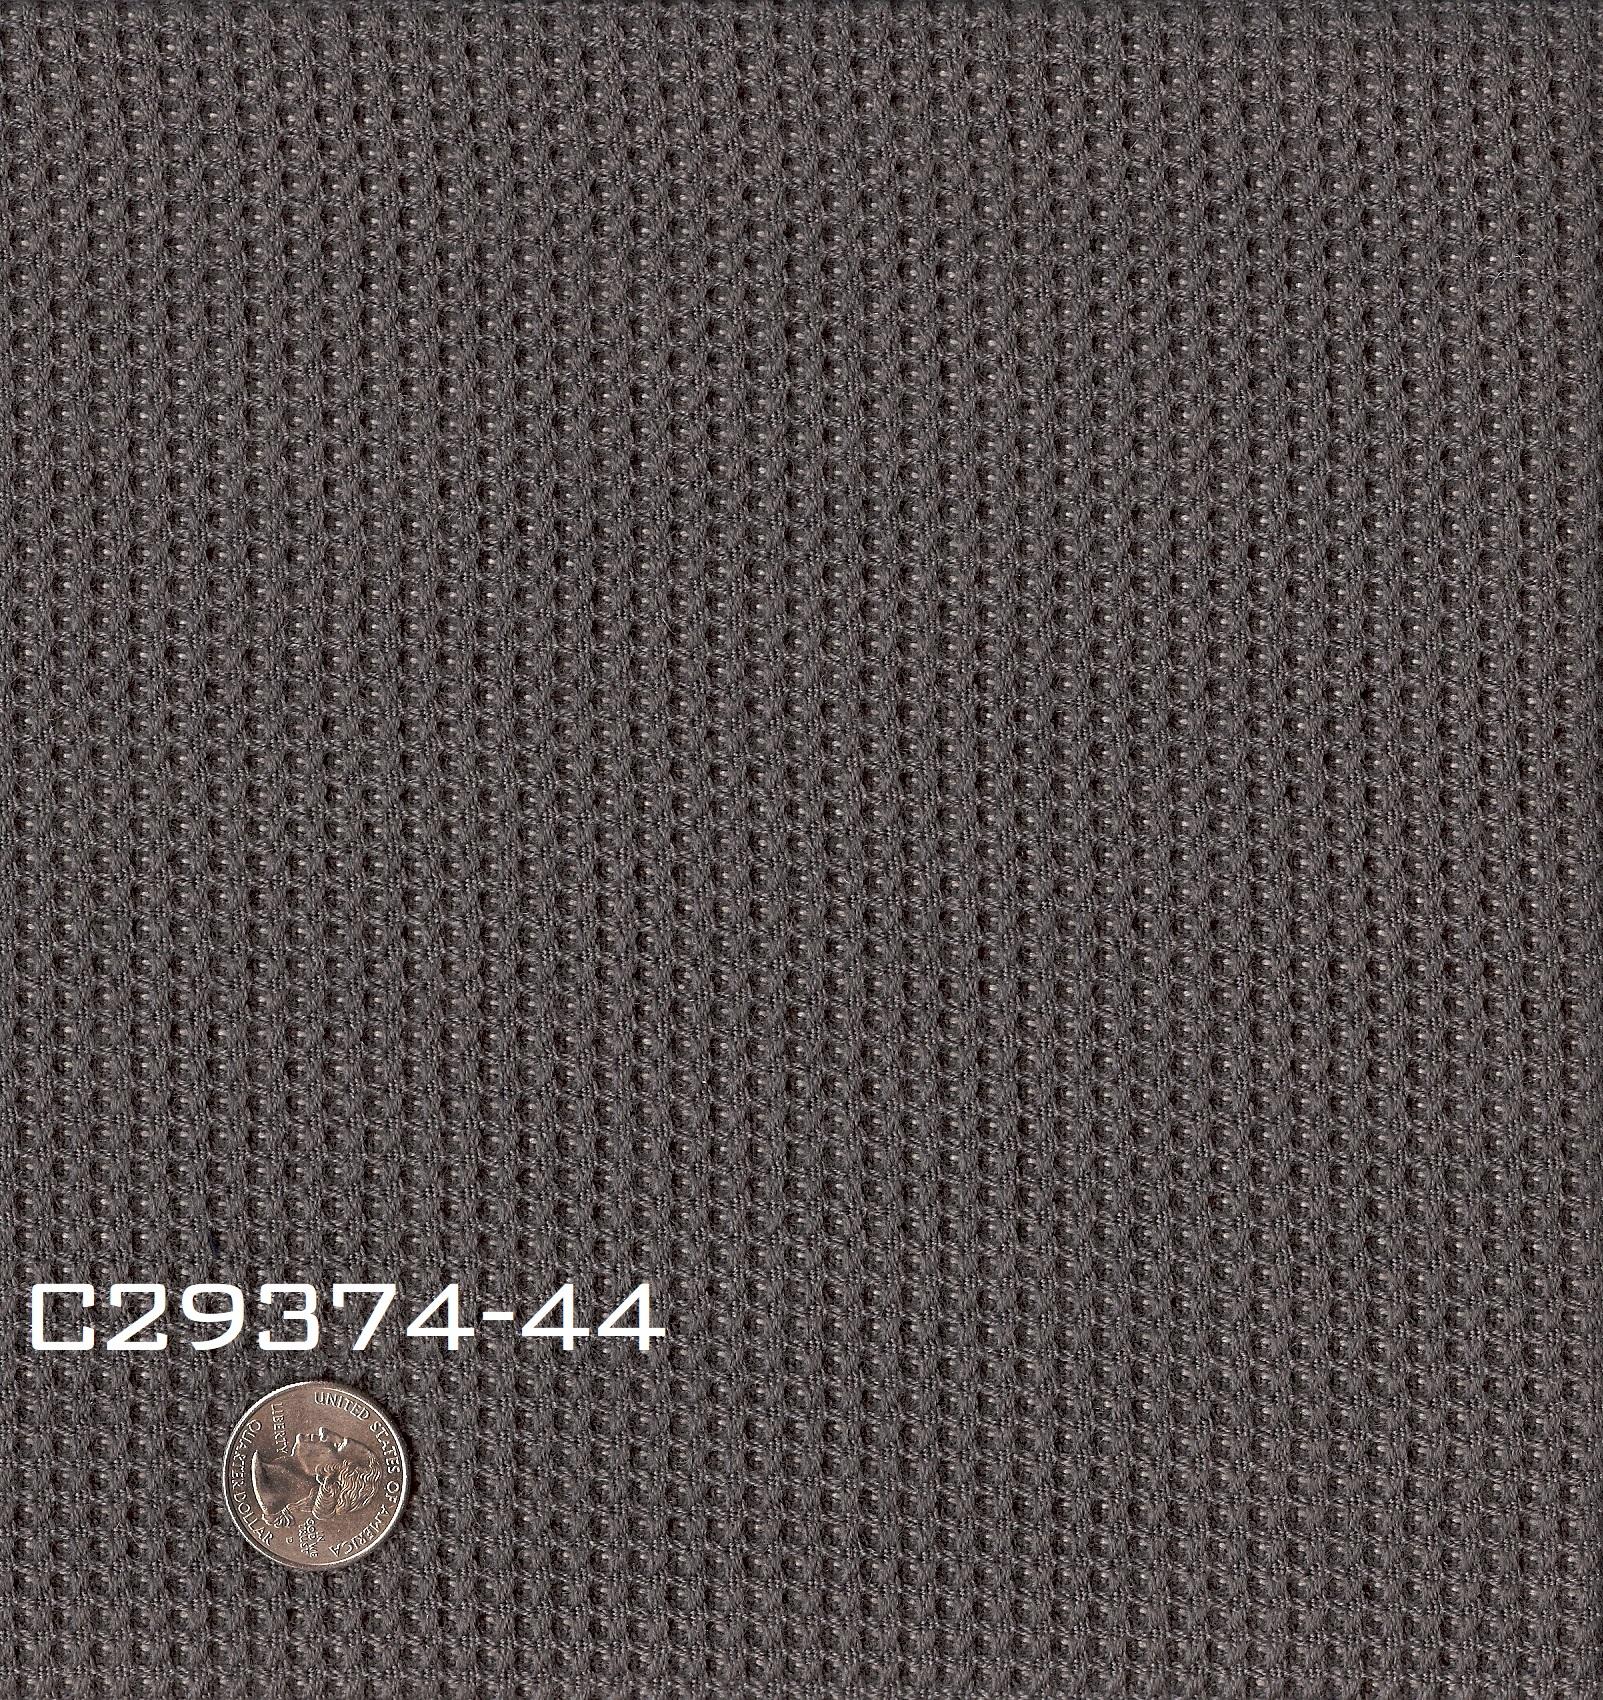 C29374-44